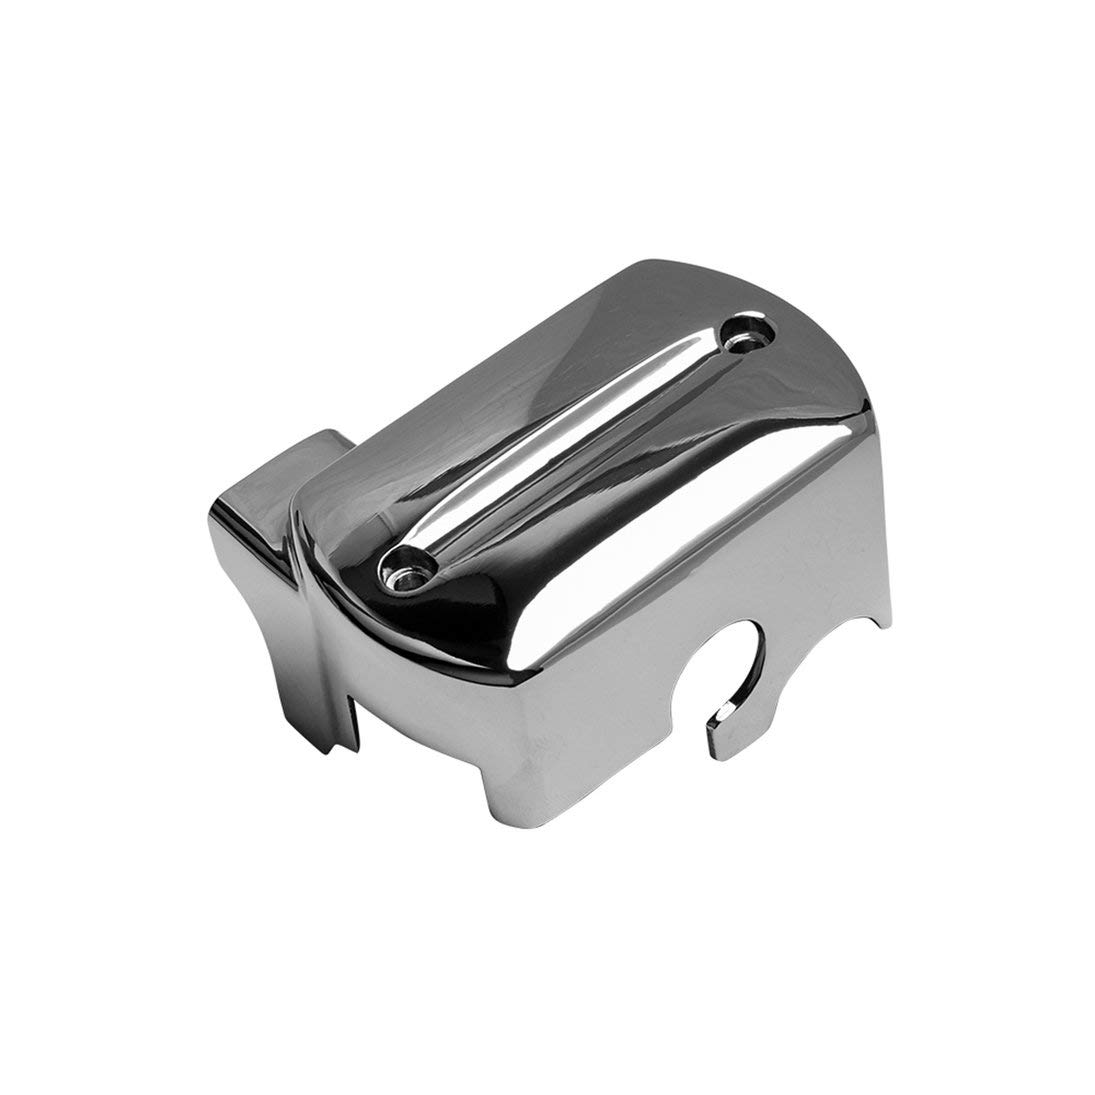 Togames-IT Brake Fluid Master Cylinder Cover Reservoir cap for Yamaha V-Star 650 950 1100 Motorcycle Aftermarket Replacement